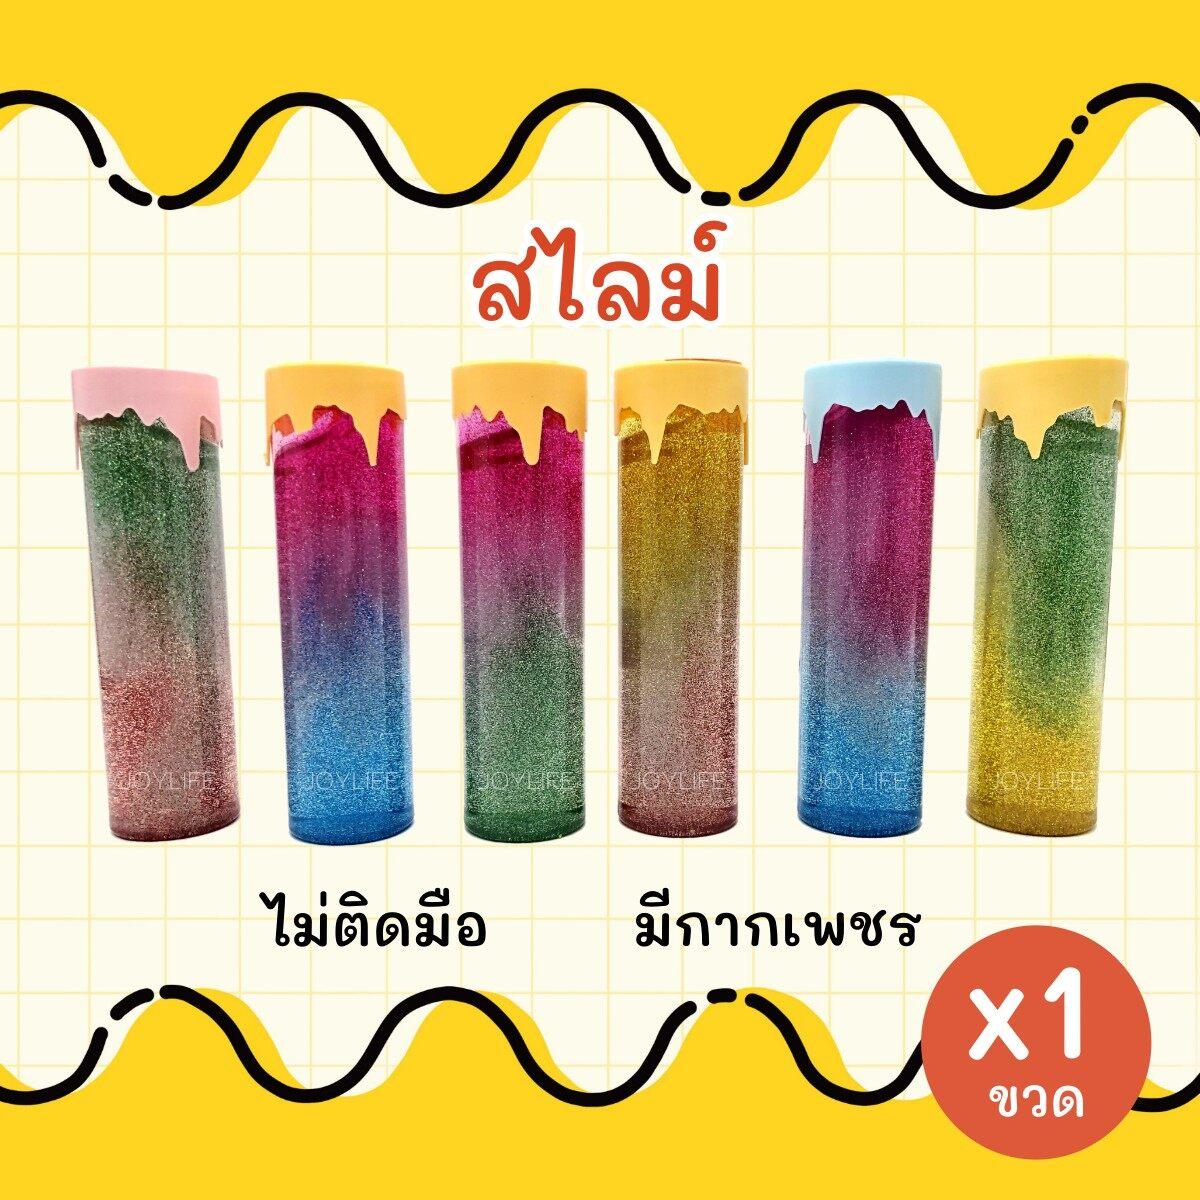 Joylife สไลม์ สลาม กากเพชร กระปุกใหญ่ สีสวย ไม่ติดมือ ราคาถูก ของเล่นเด็ก (1 กระปุก) Glitter Slime For Kids.